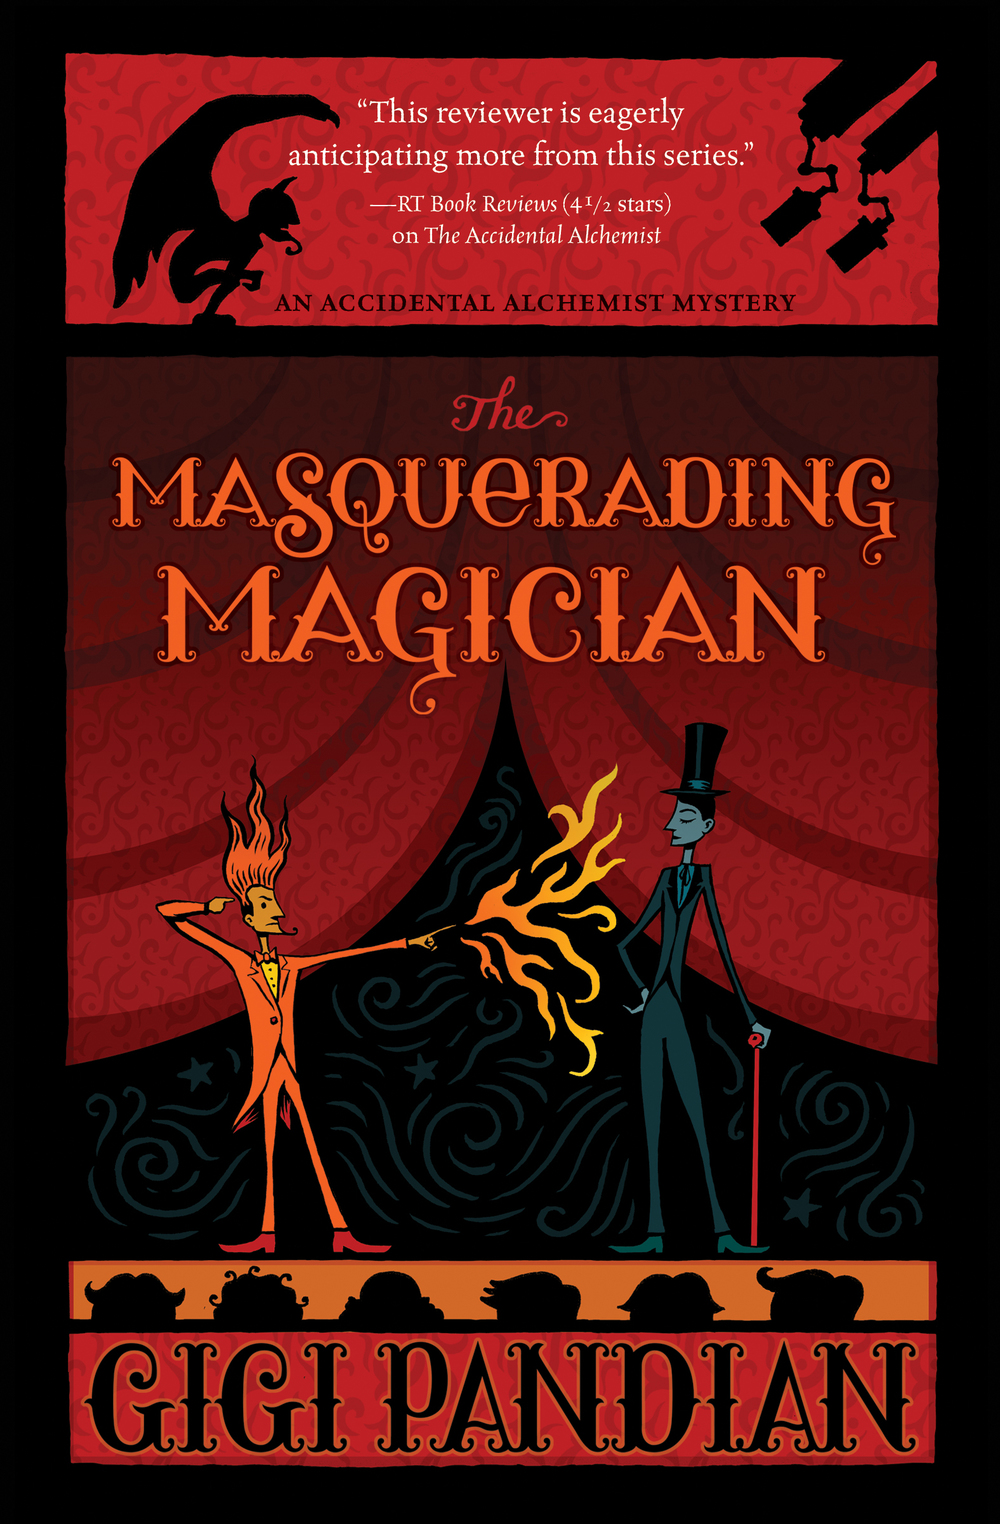 Masquerading-Magician-FINAL-COVER.jpg